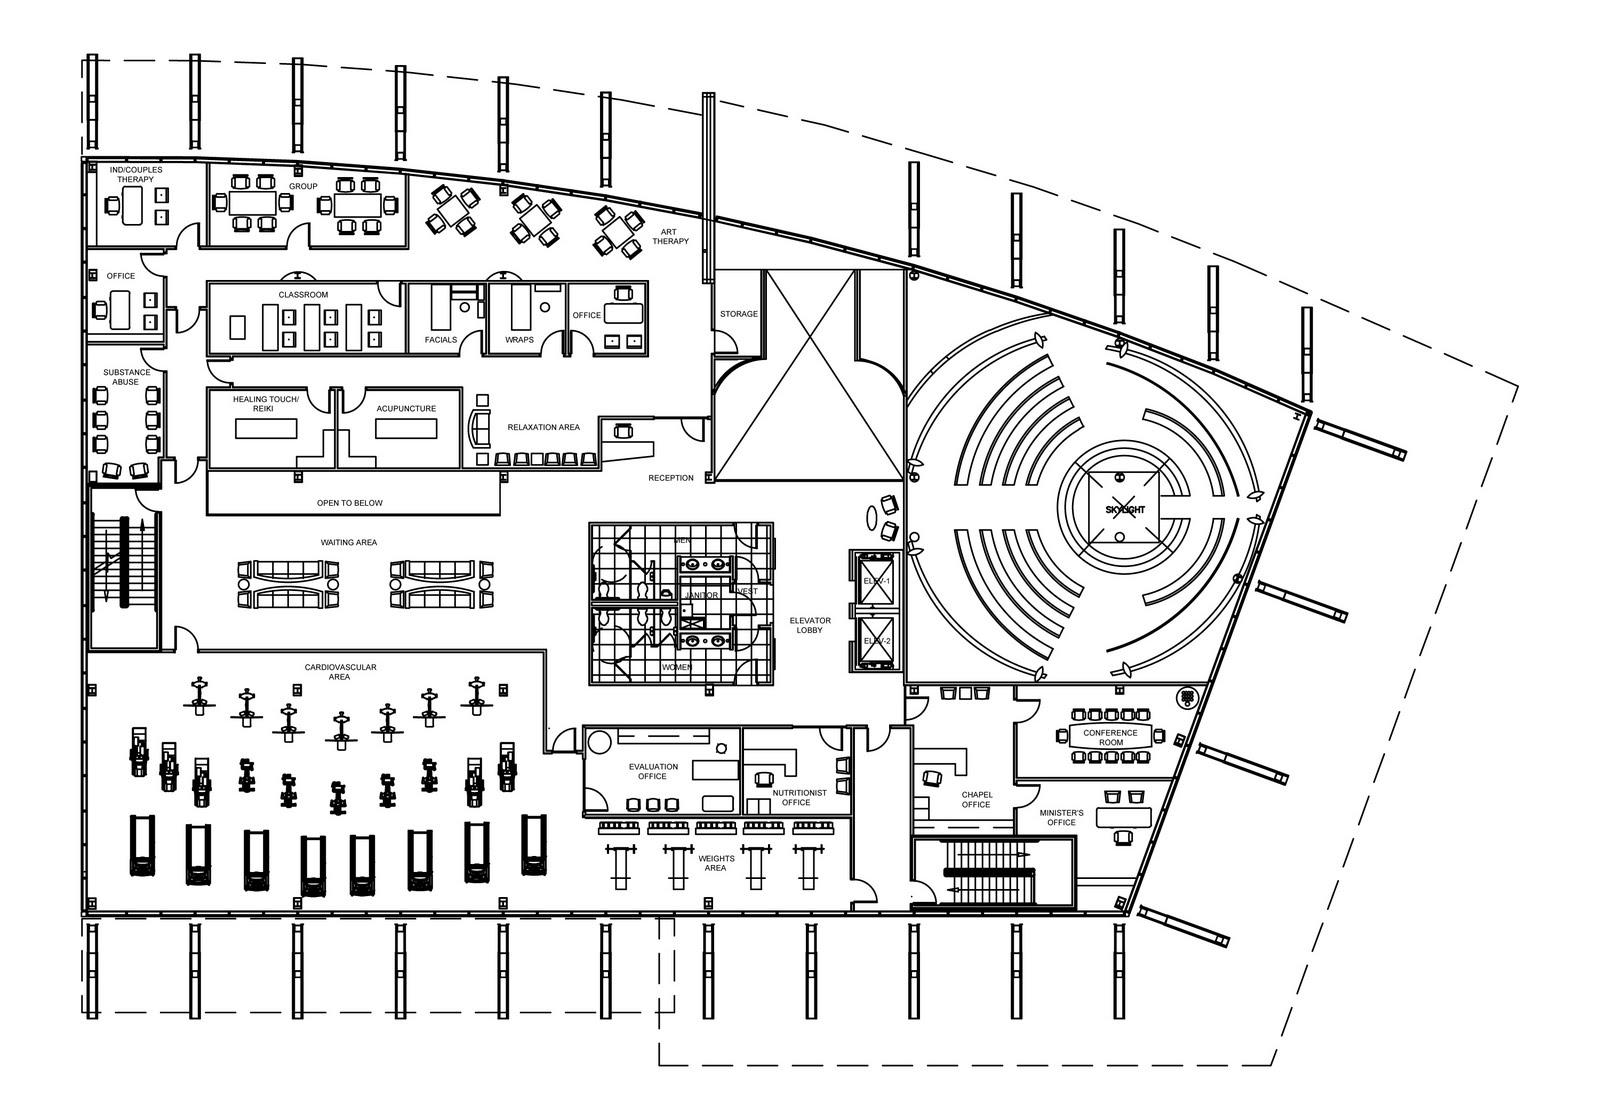 GreenSphere Wellness Center: Revised 2nd Level Floor Plan